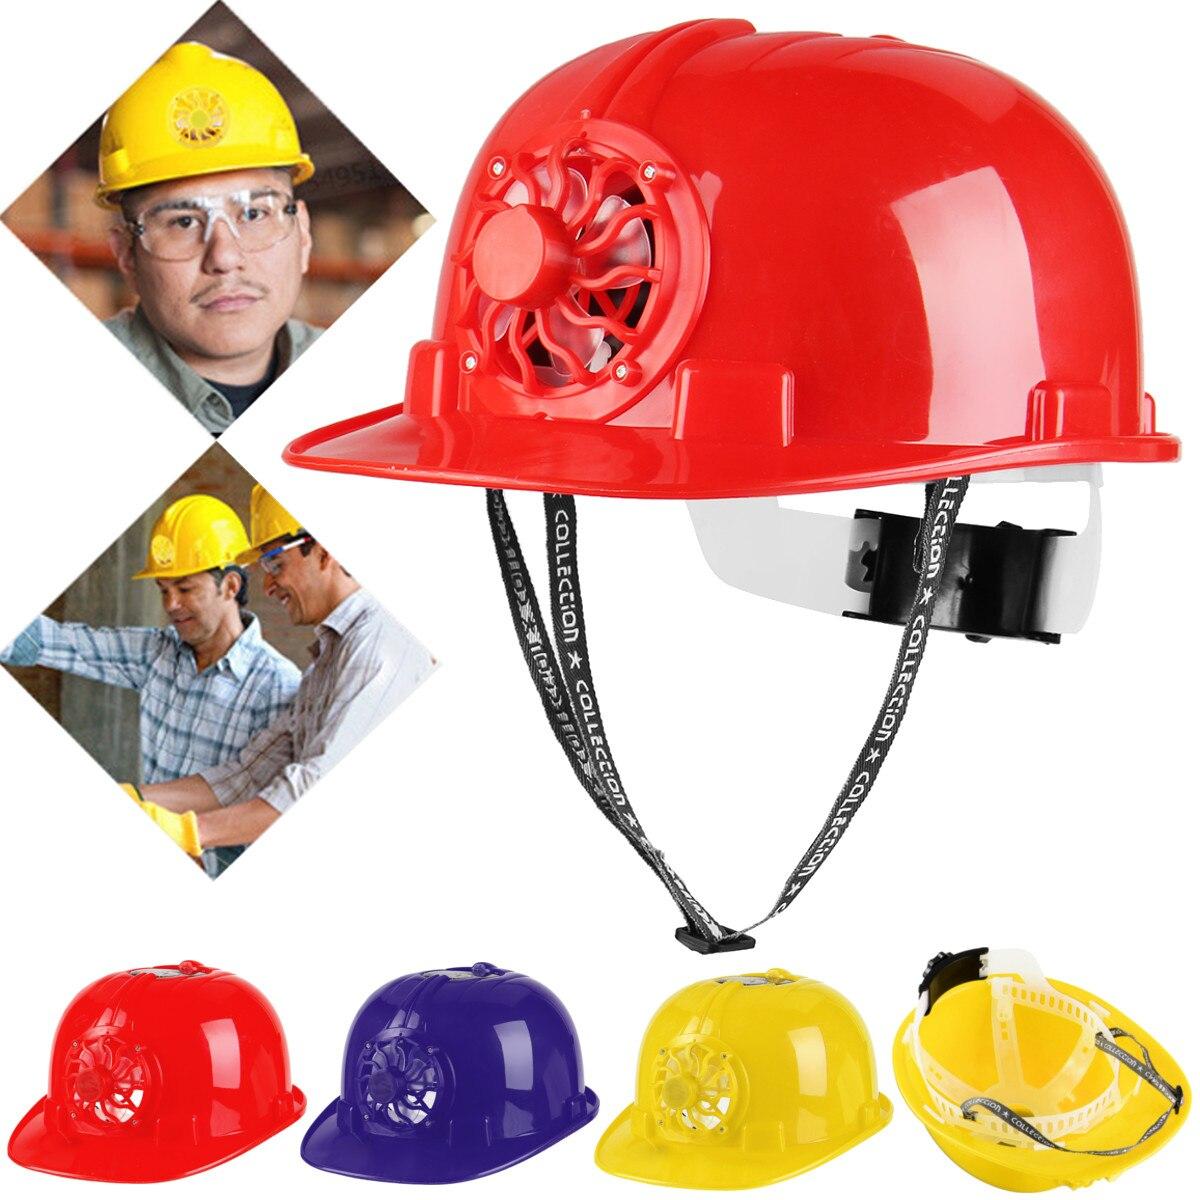 Cool Fan Summer Energy Saving Smile Solar Powered Safety Helmet Hard Hat Cap